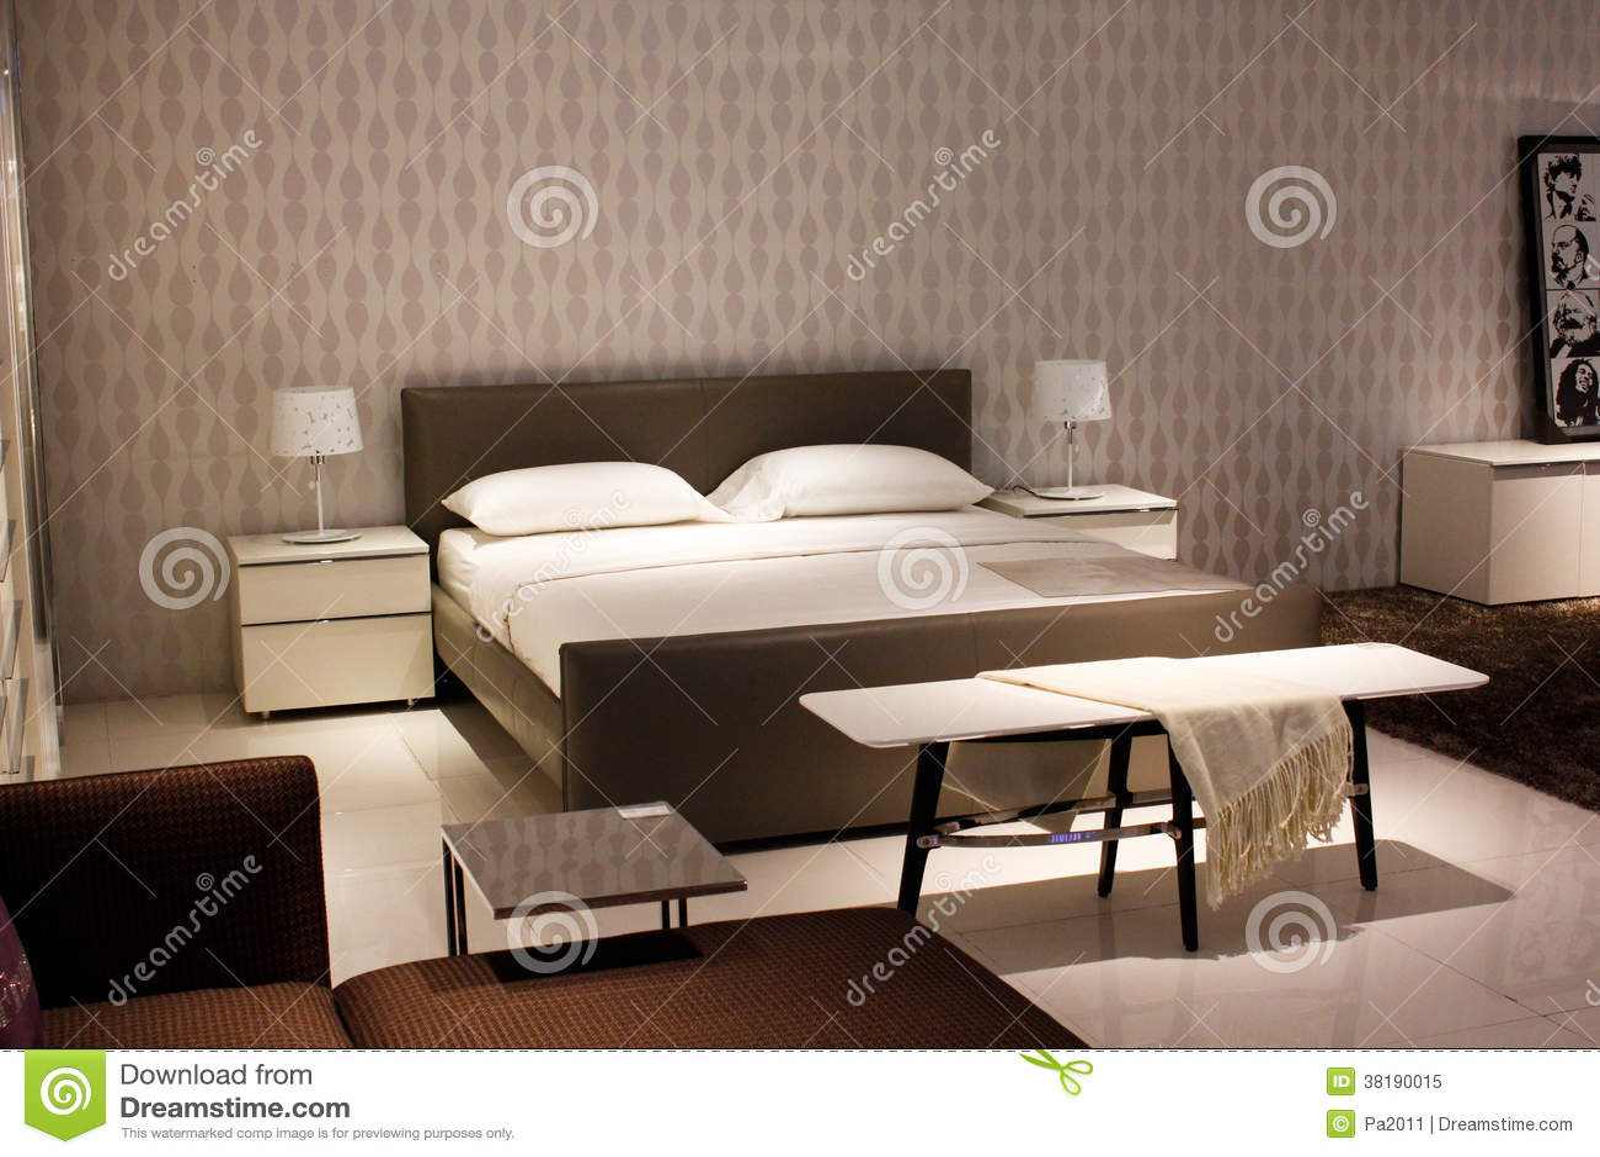 Meubles modernes chinois de style chambre coucher for Chambre a coucher de style